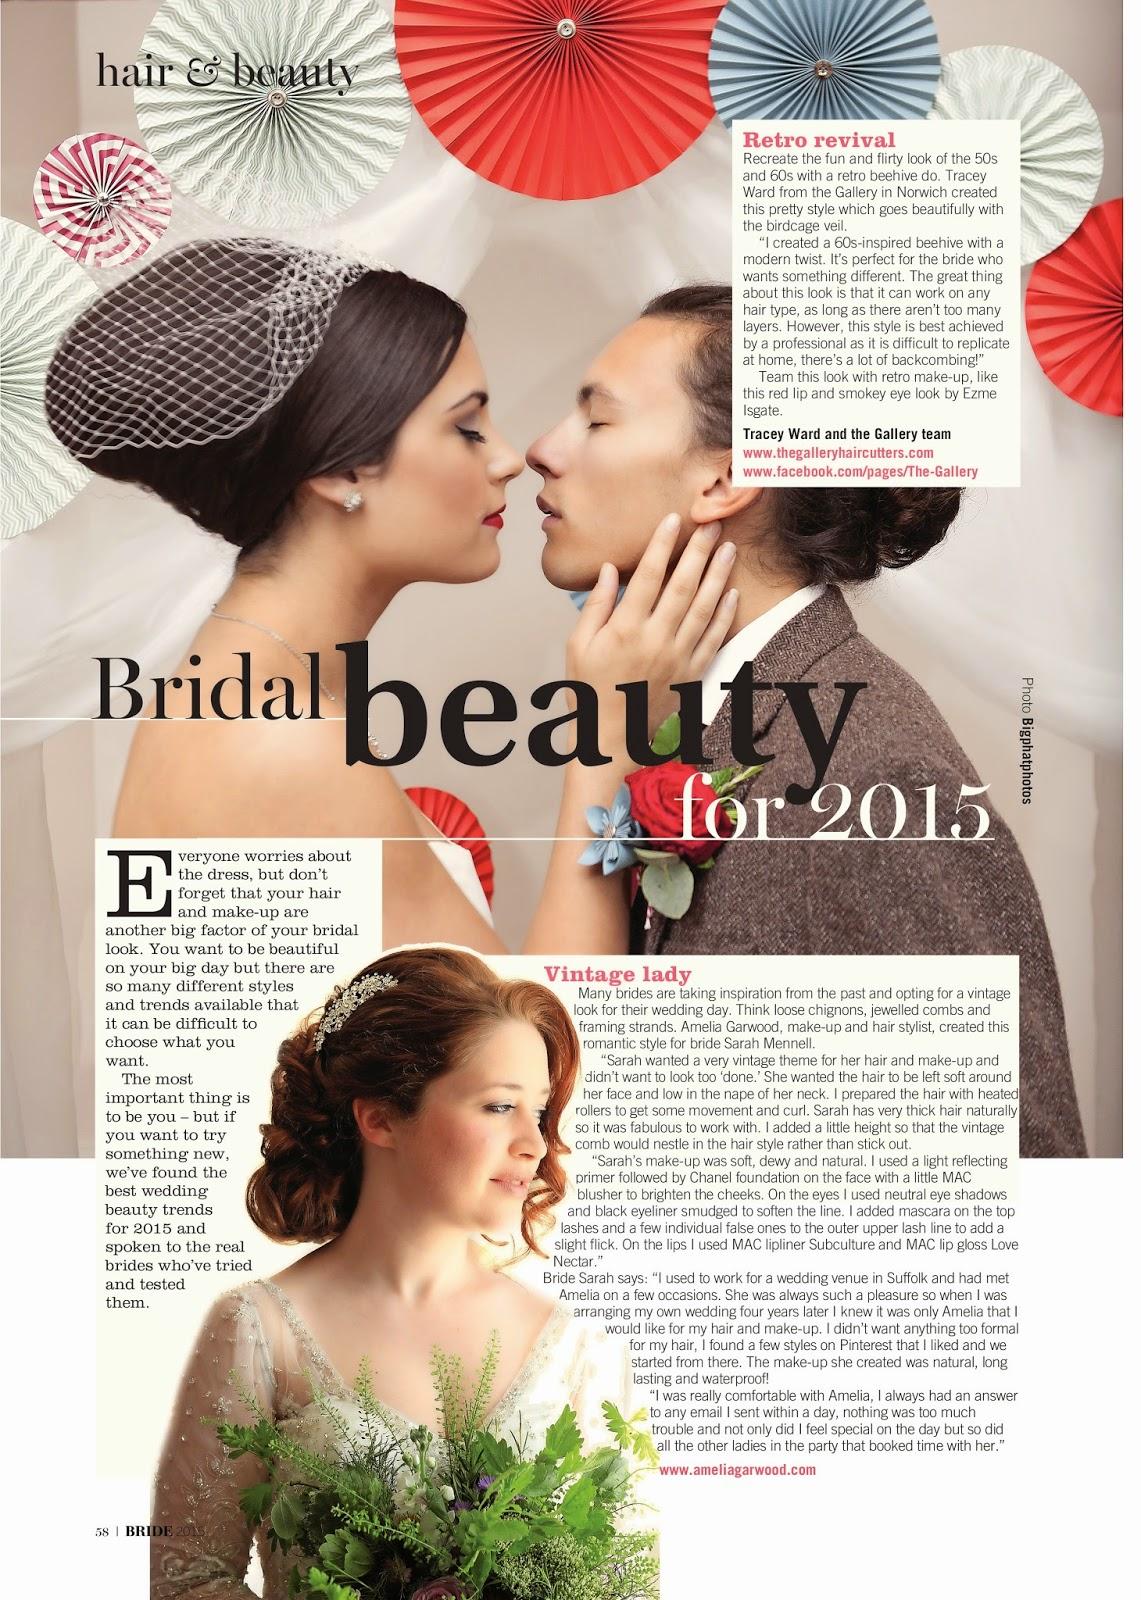 Bridal beauty feature, Bride magazine